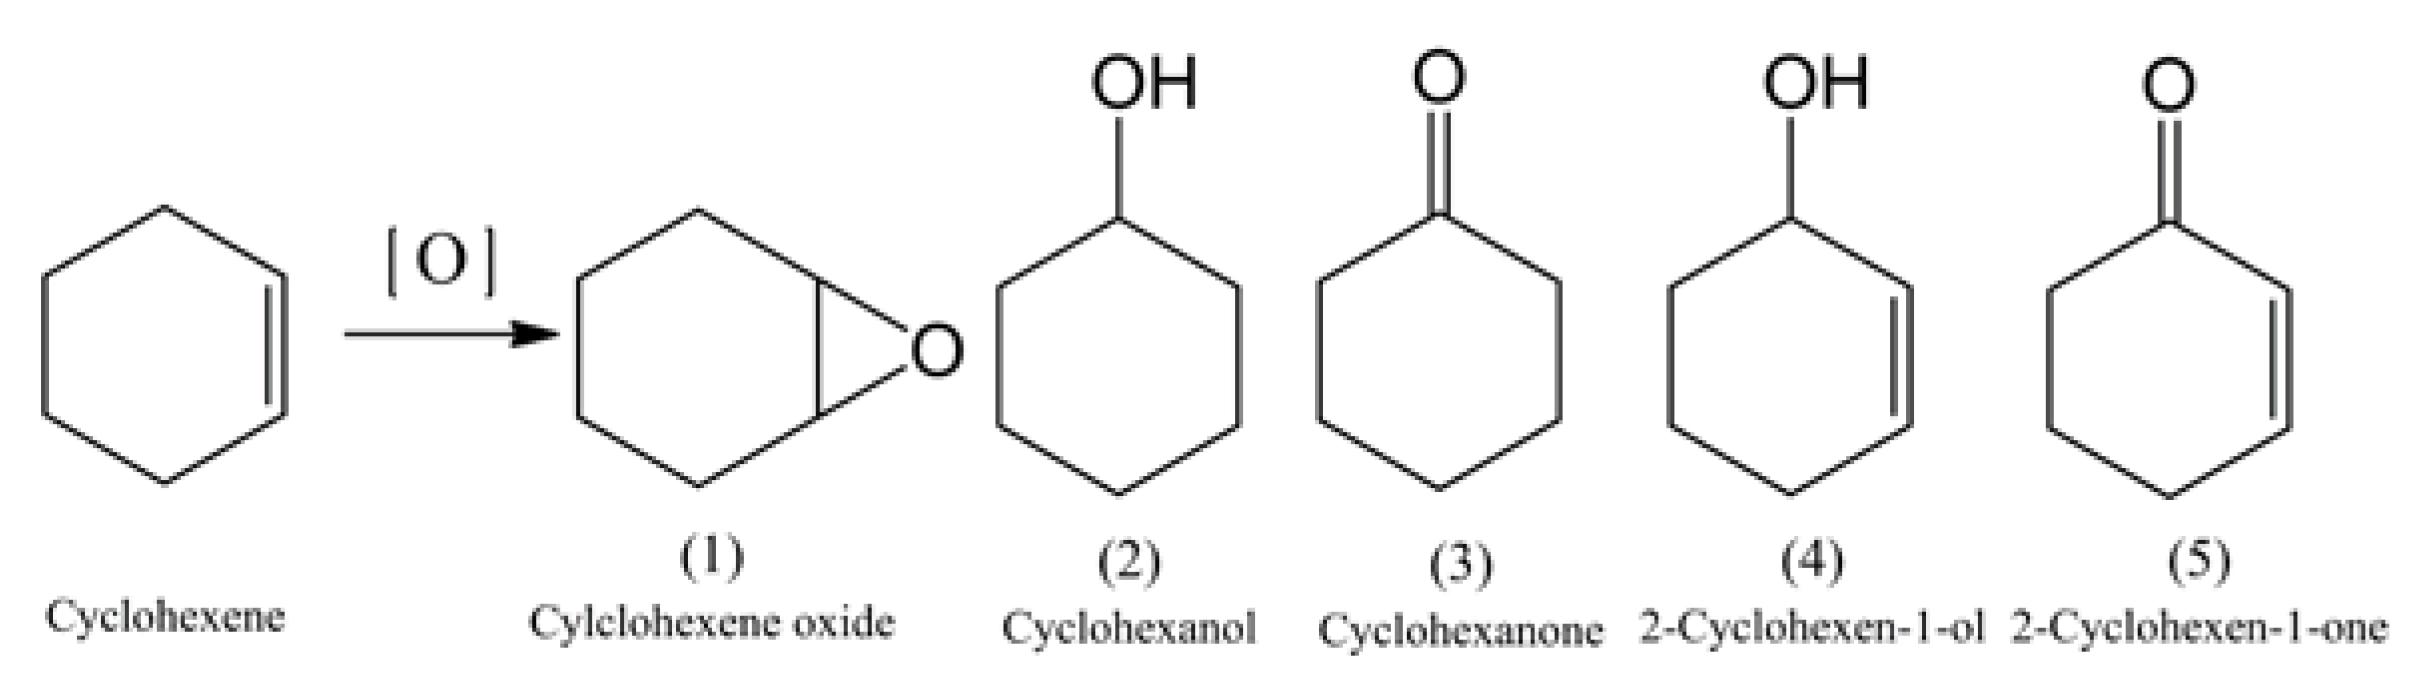 Cyclohexene from cyclohexanol